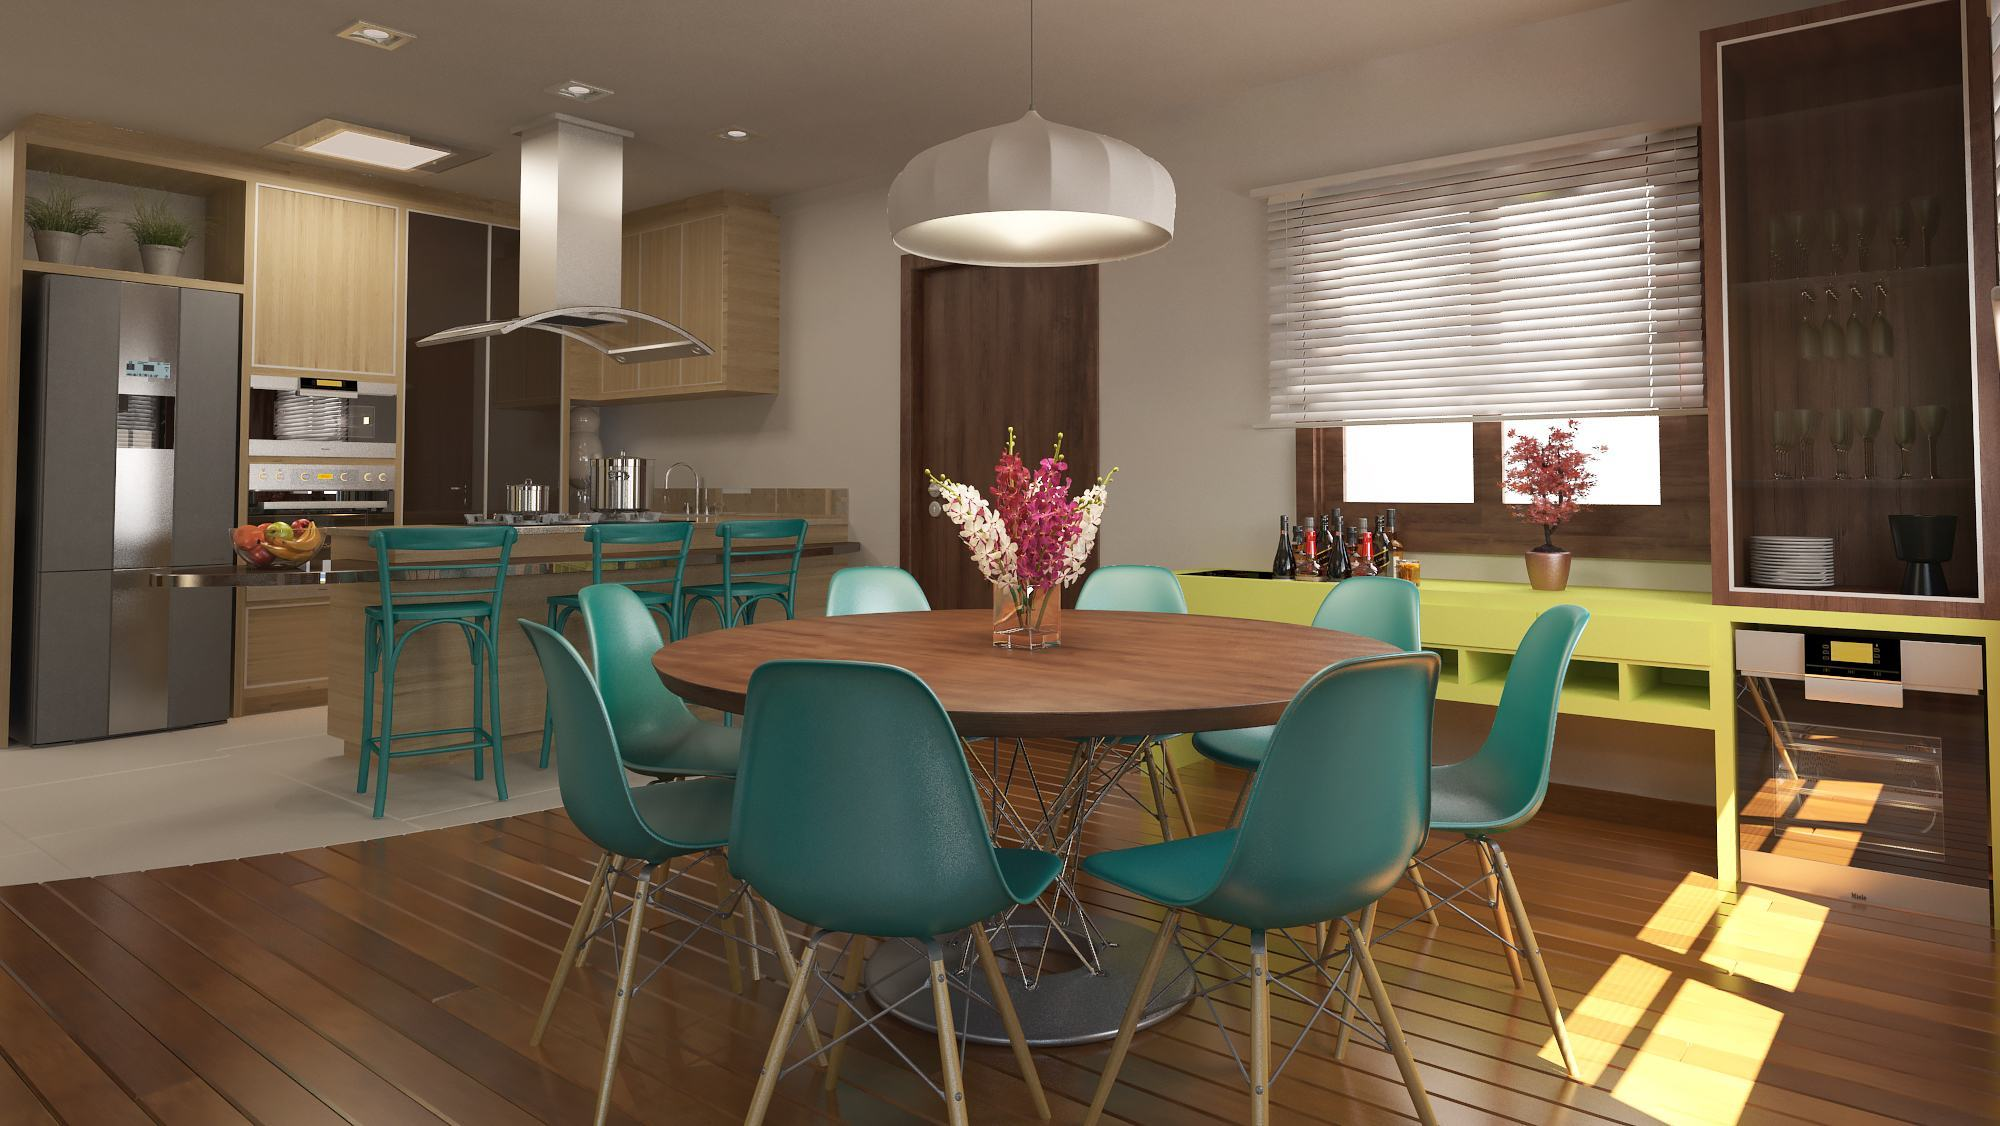 Mesas De Jantar Modernas 60 Projetos Dicas E Fotos  -> Sala De Jantar Pequena Mesa Redonda Ou Retangular